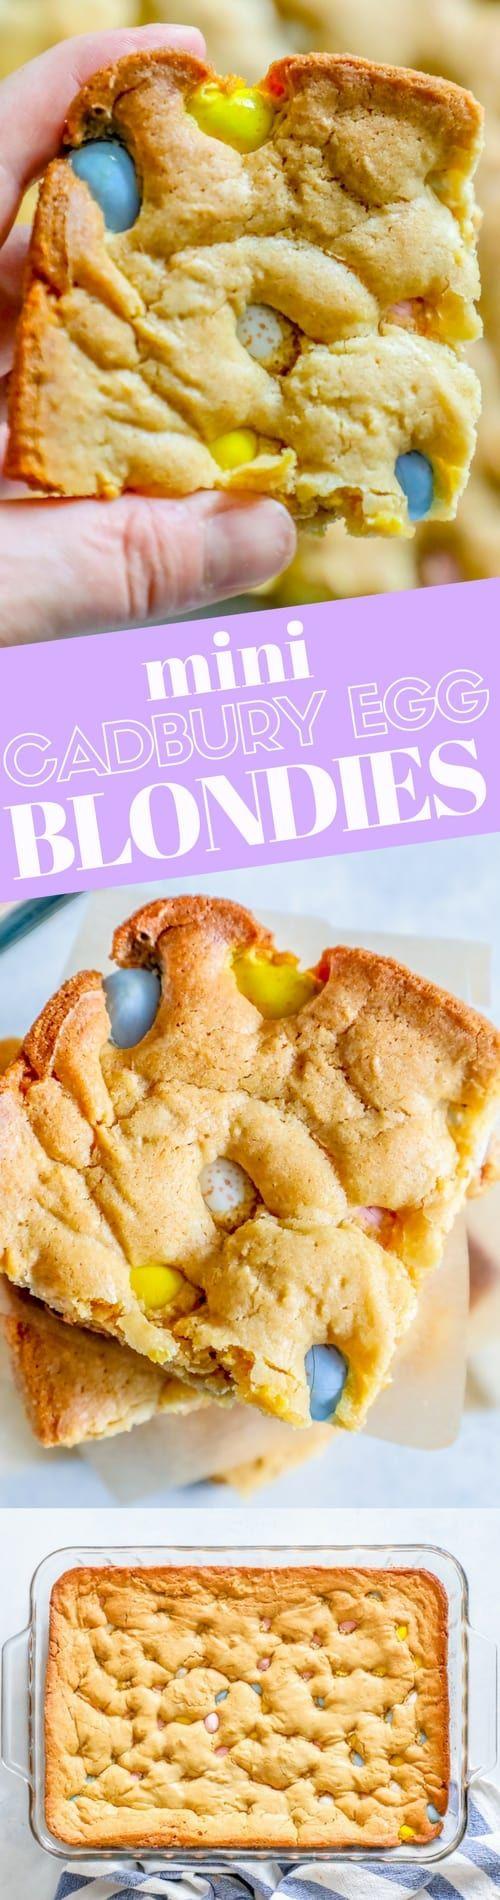 Easy Cadbury Mini Egg Blondies Recipe ⋆ Sweet C's Designs   – Create with Sweet C's Designs